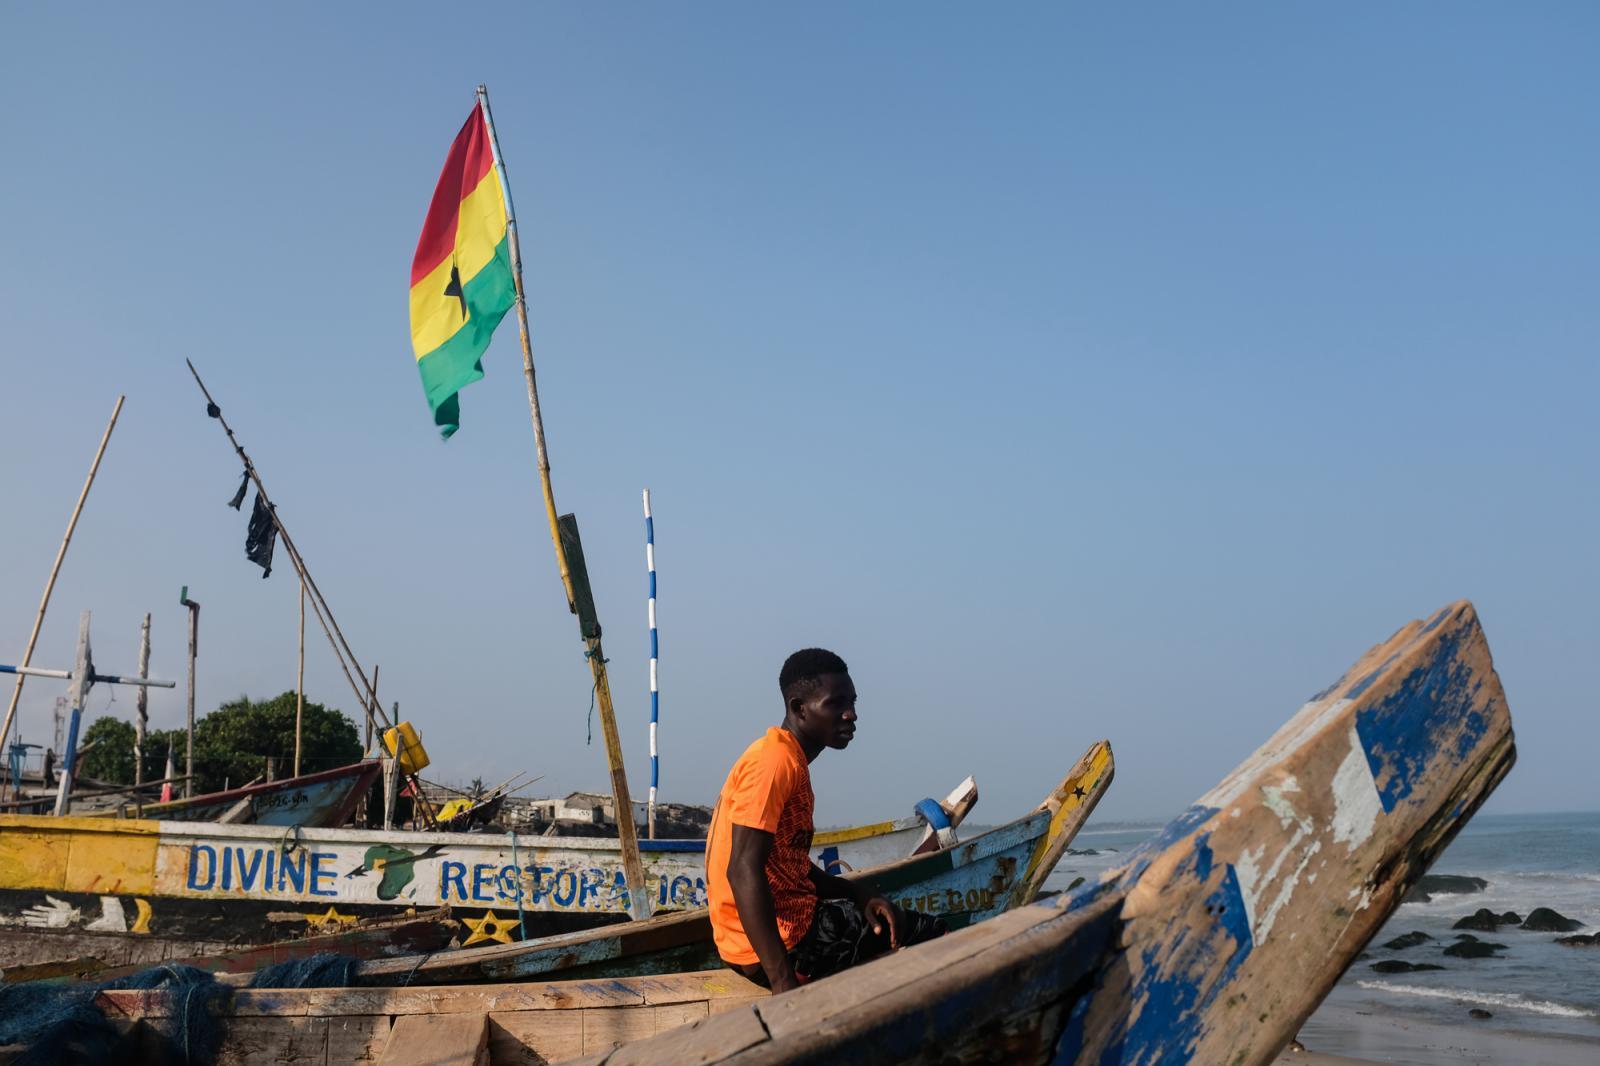 Photography image - Loading nipah-dennis-community-winneba-everydayafrica-05.JPG